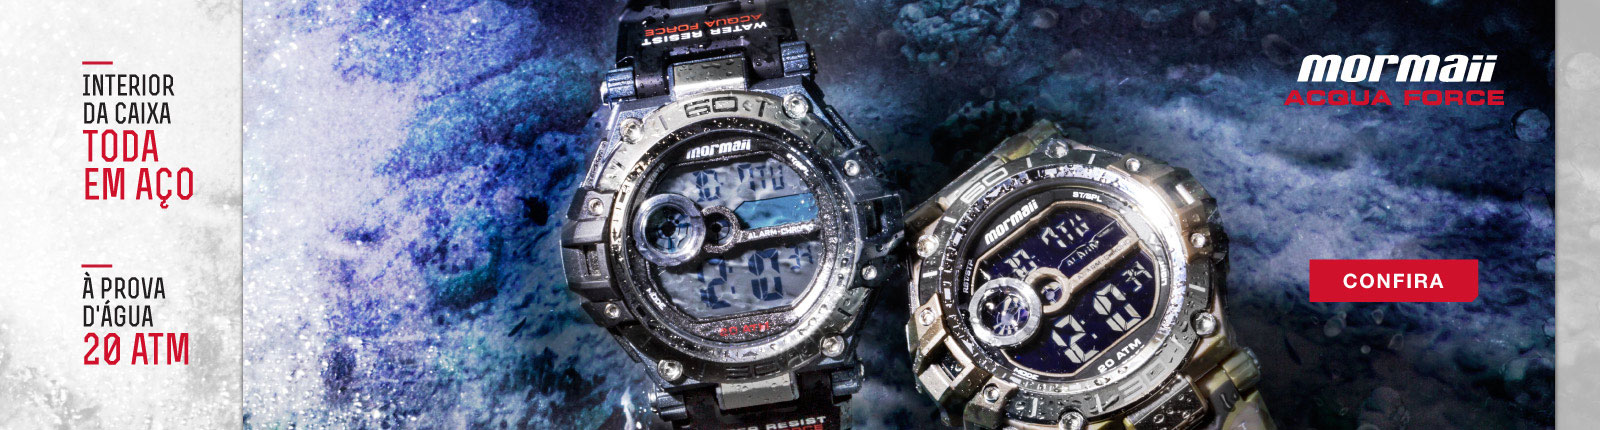 Relógio Acqua Force